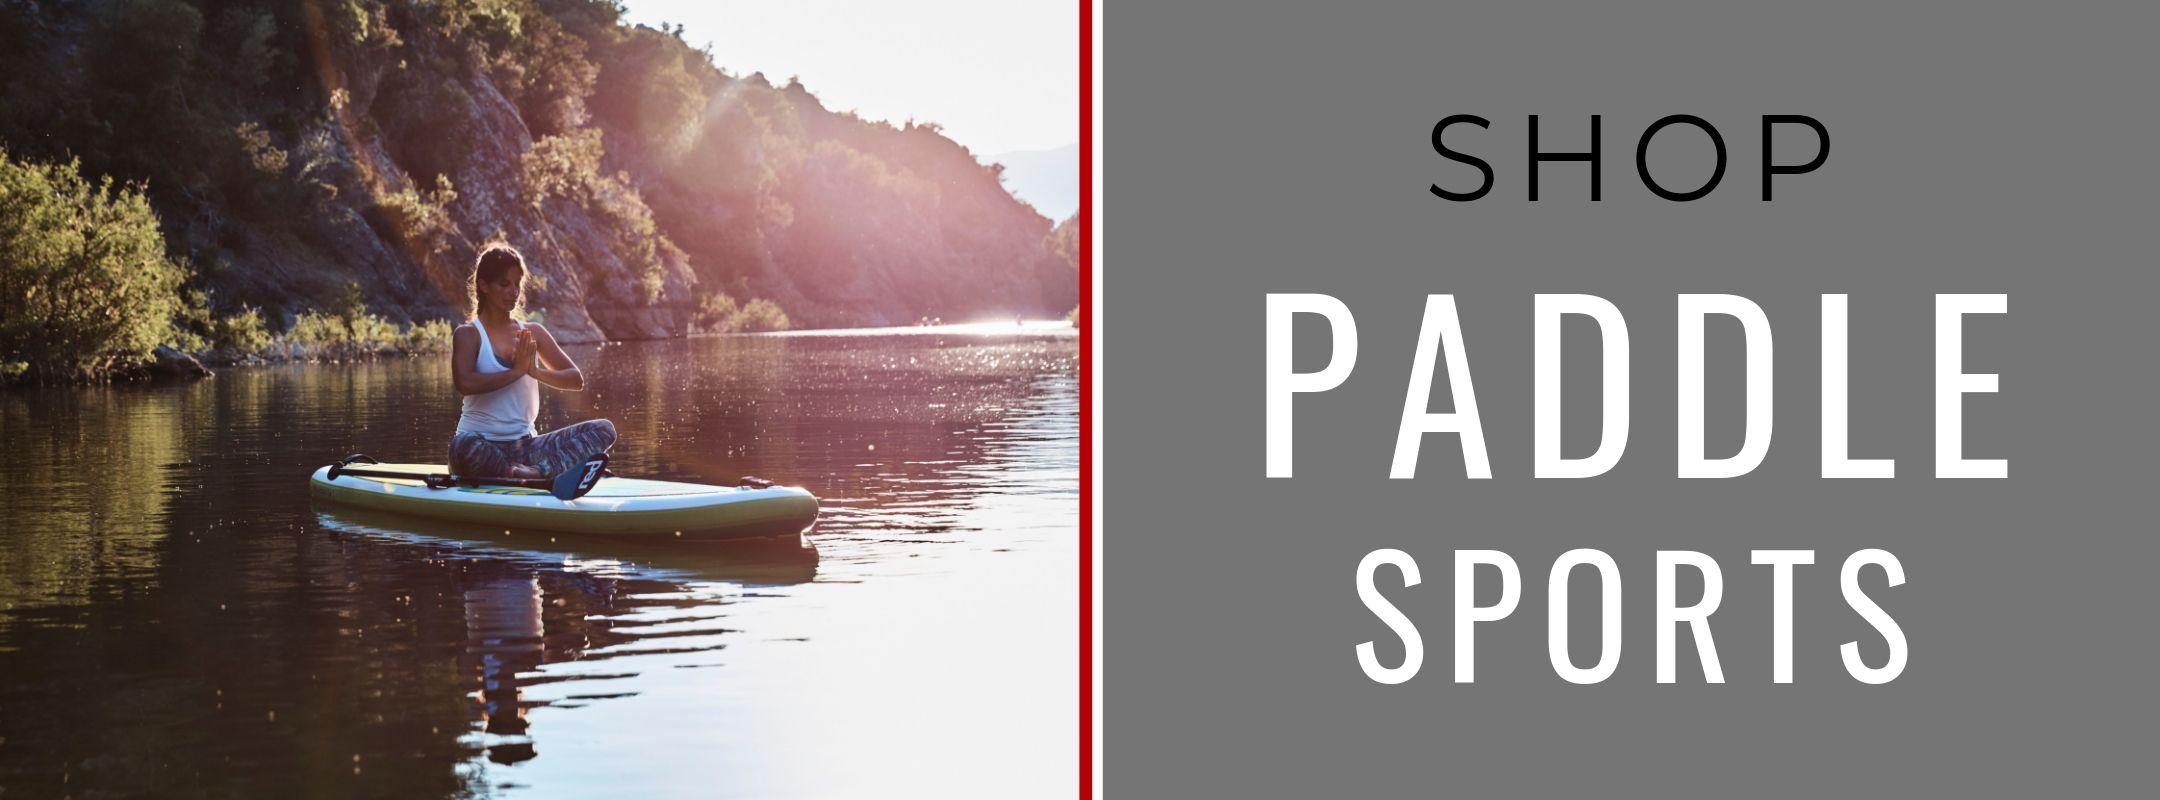 shop paddle sports b.jpg